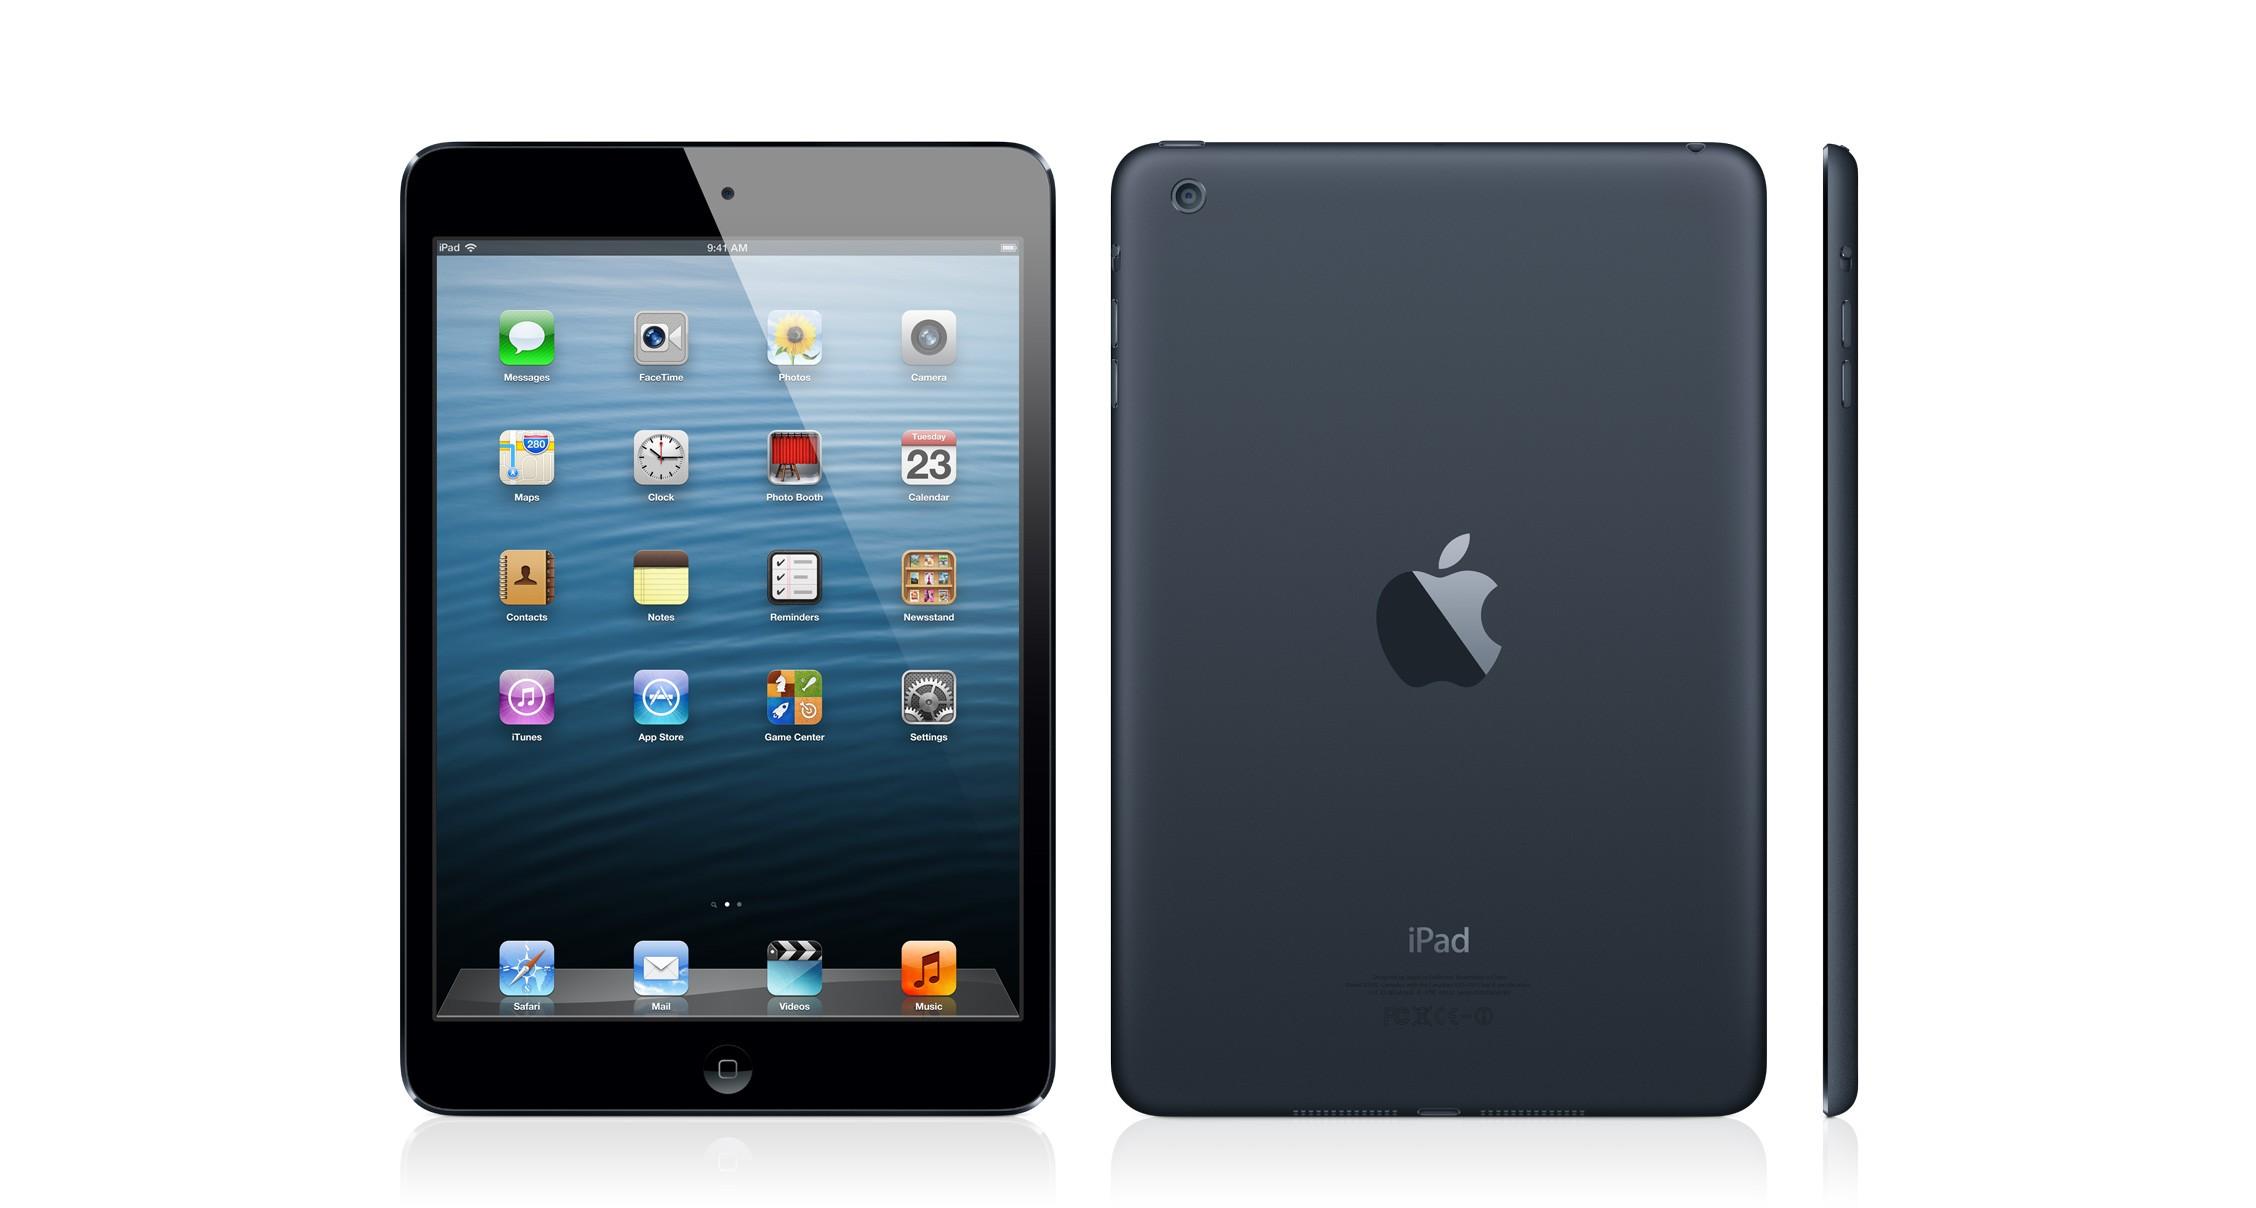 Apple iPad Air 2, iPad Mini 3 Release Date Announced; Pre-Order Now Via Flipkart, Infibeam.